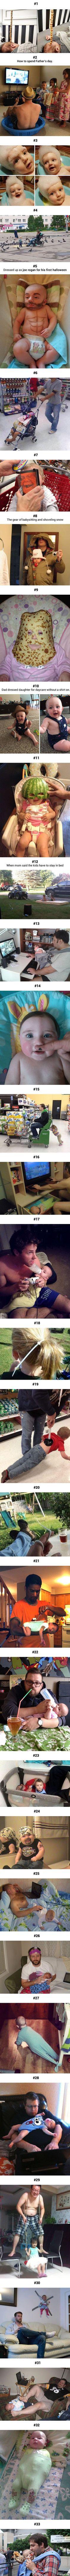 .....DADS........????????